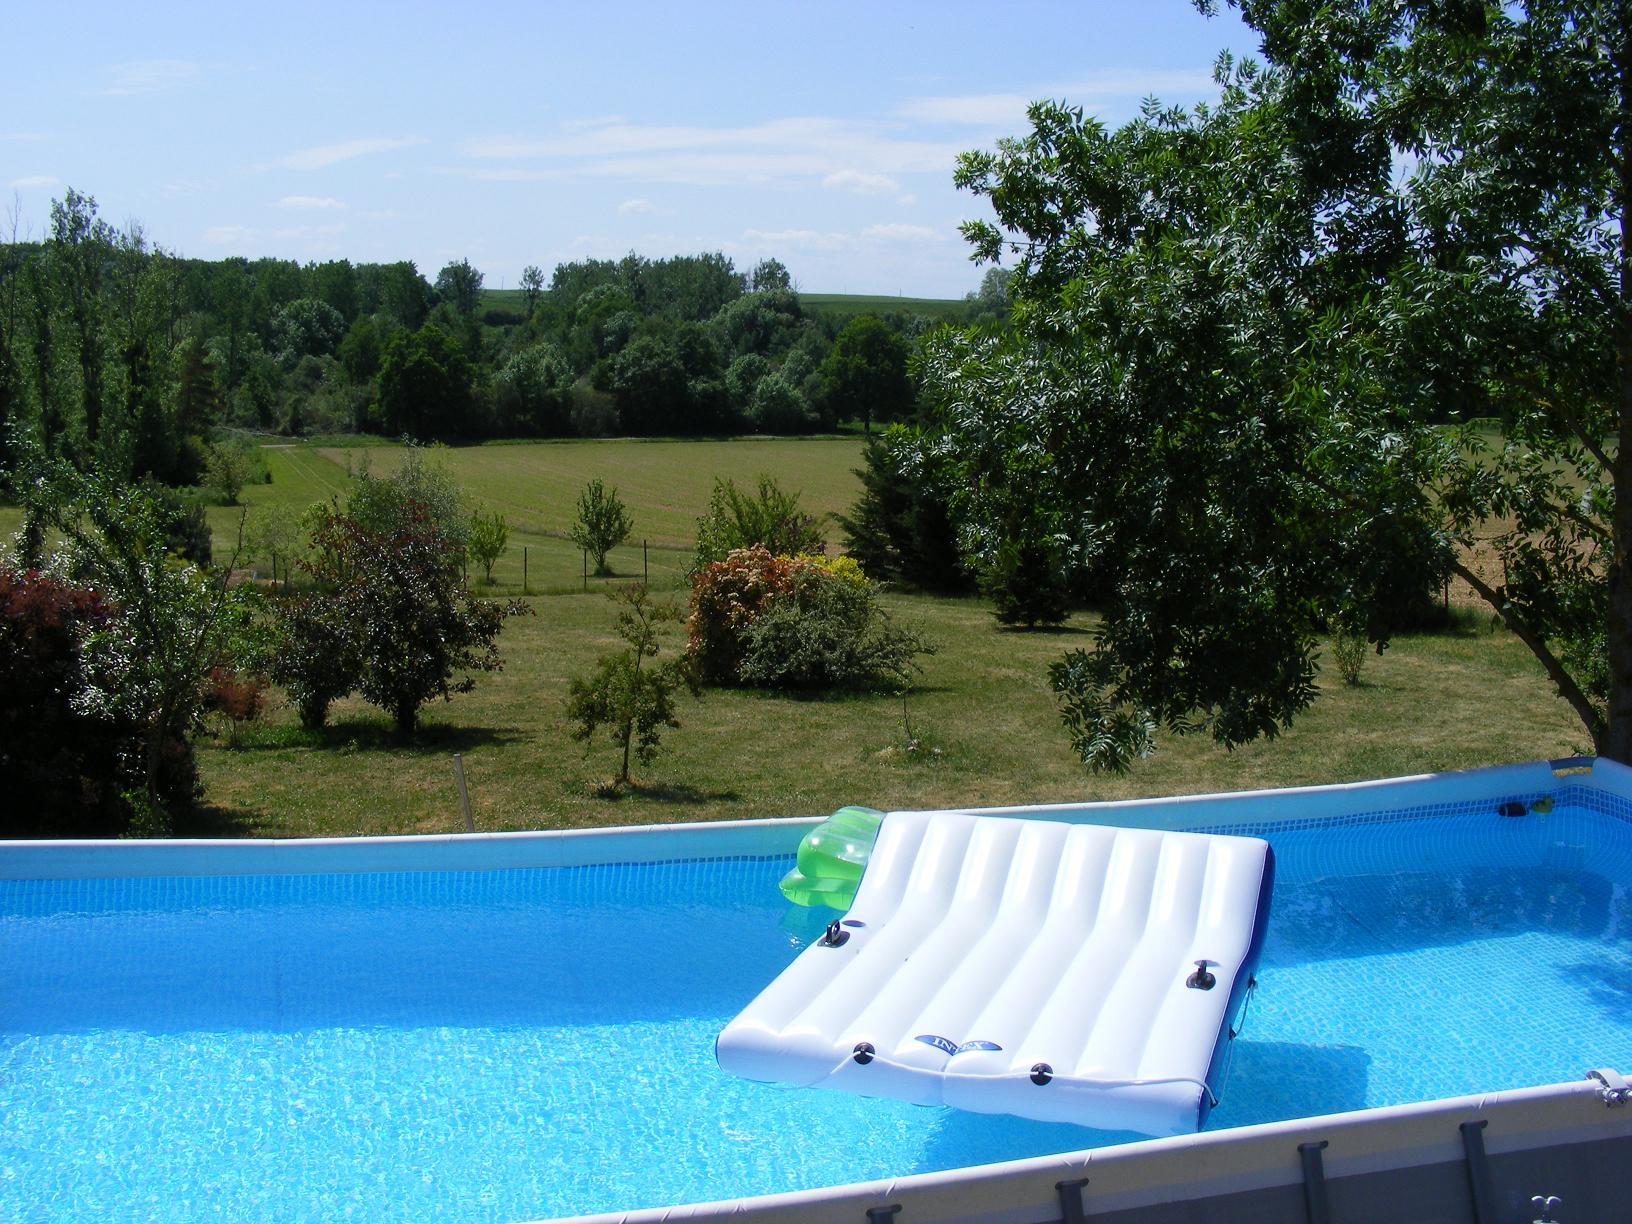 piscine paysage de rêve